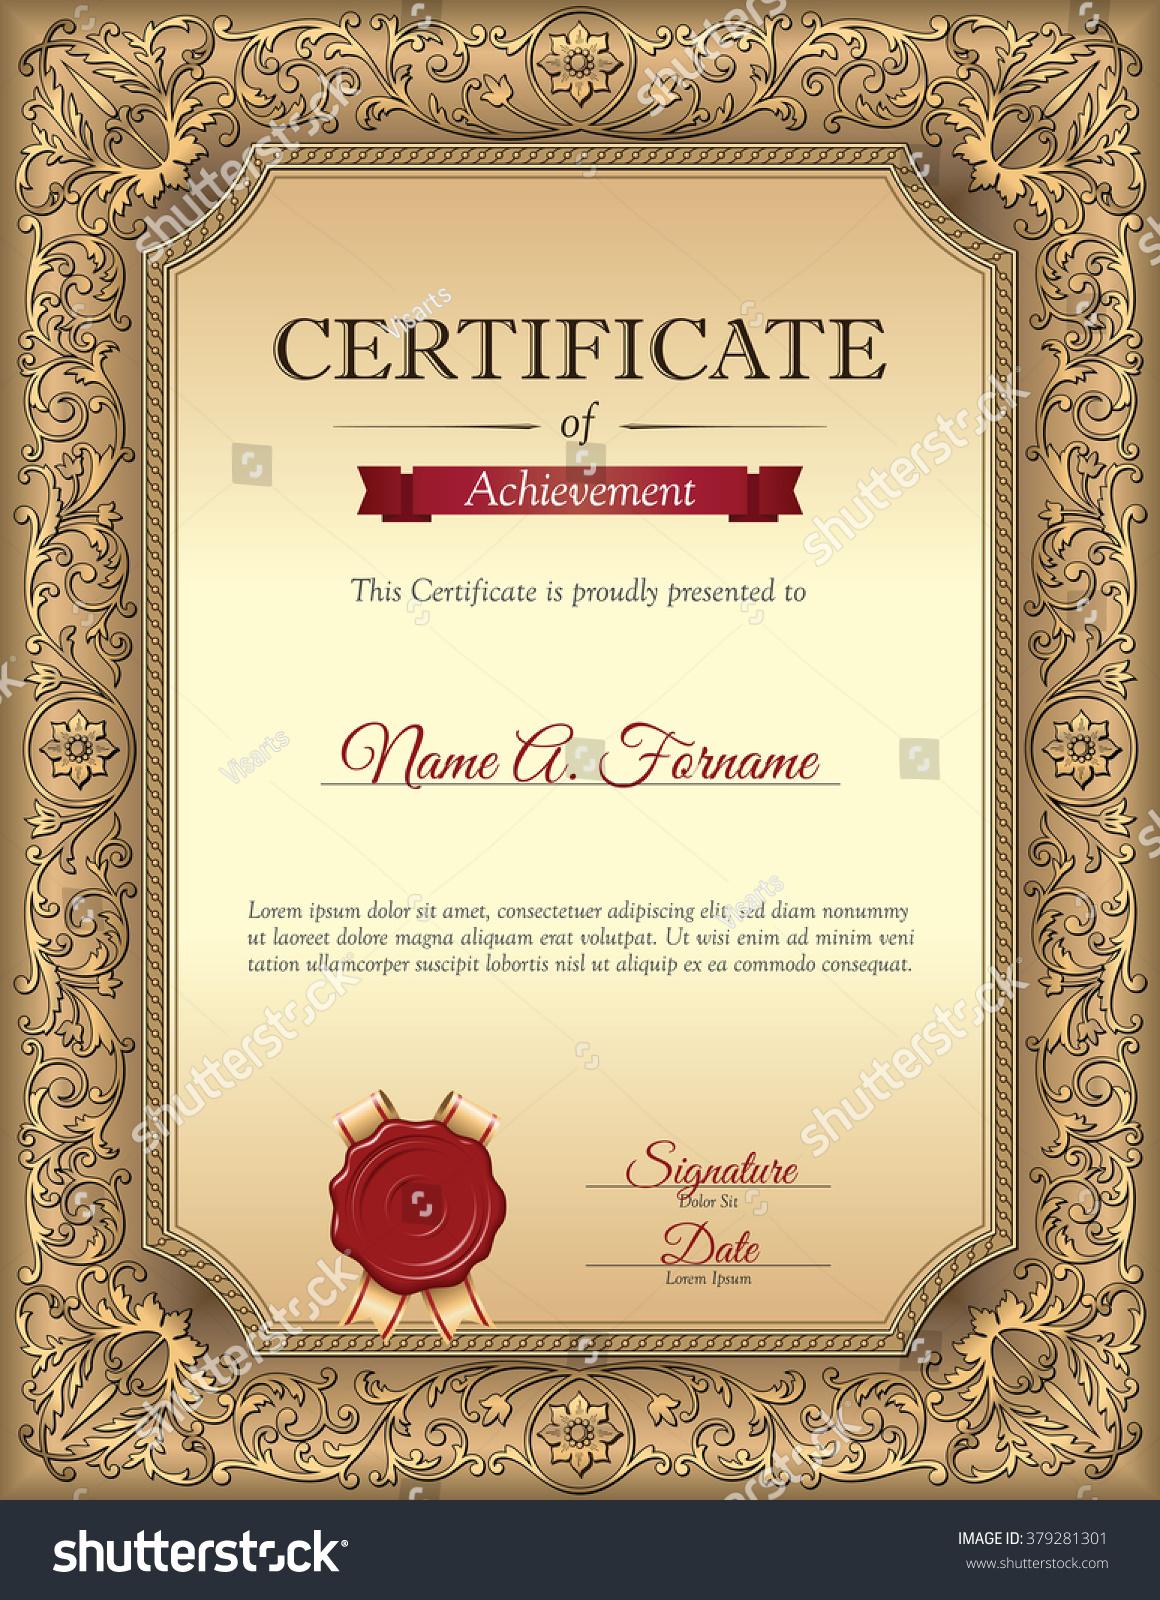 Certificate Recognition Template Vintage Floral Frame Stock Vector ...